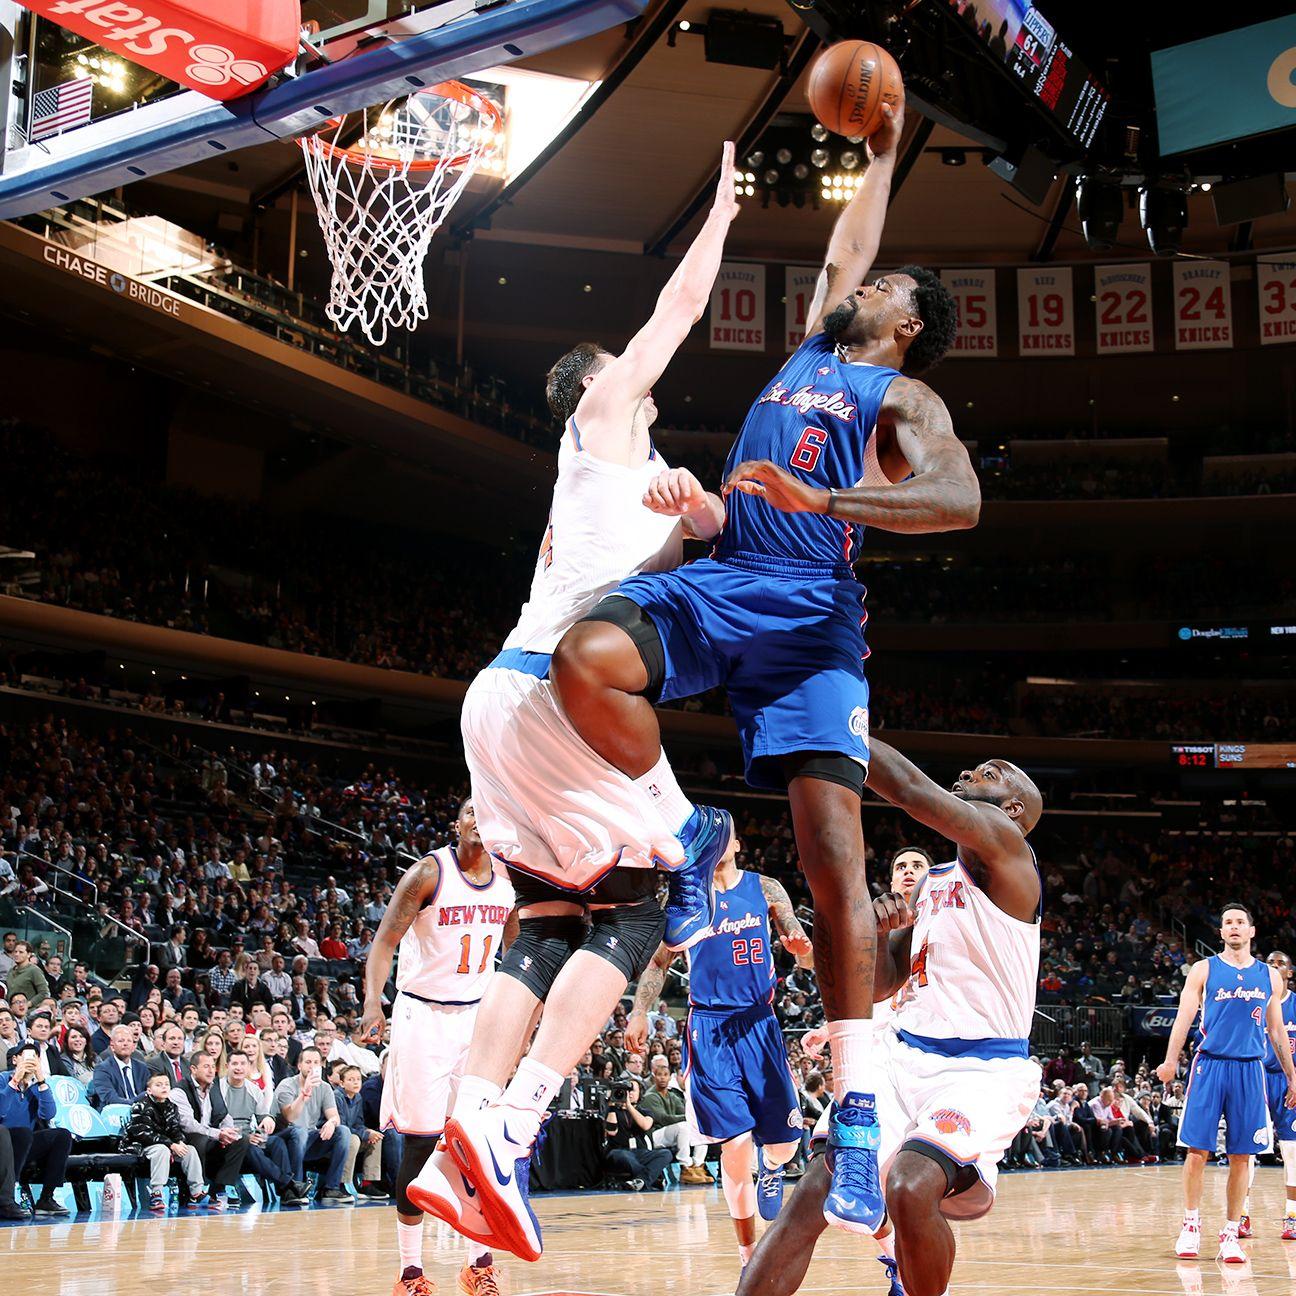 Deandre Jordan Rejoins Clippers Snubs Mavericks Los Angeles Clippers Dallas Mavericks Sports Pictures